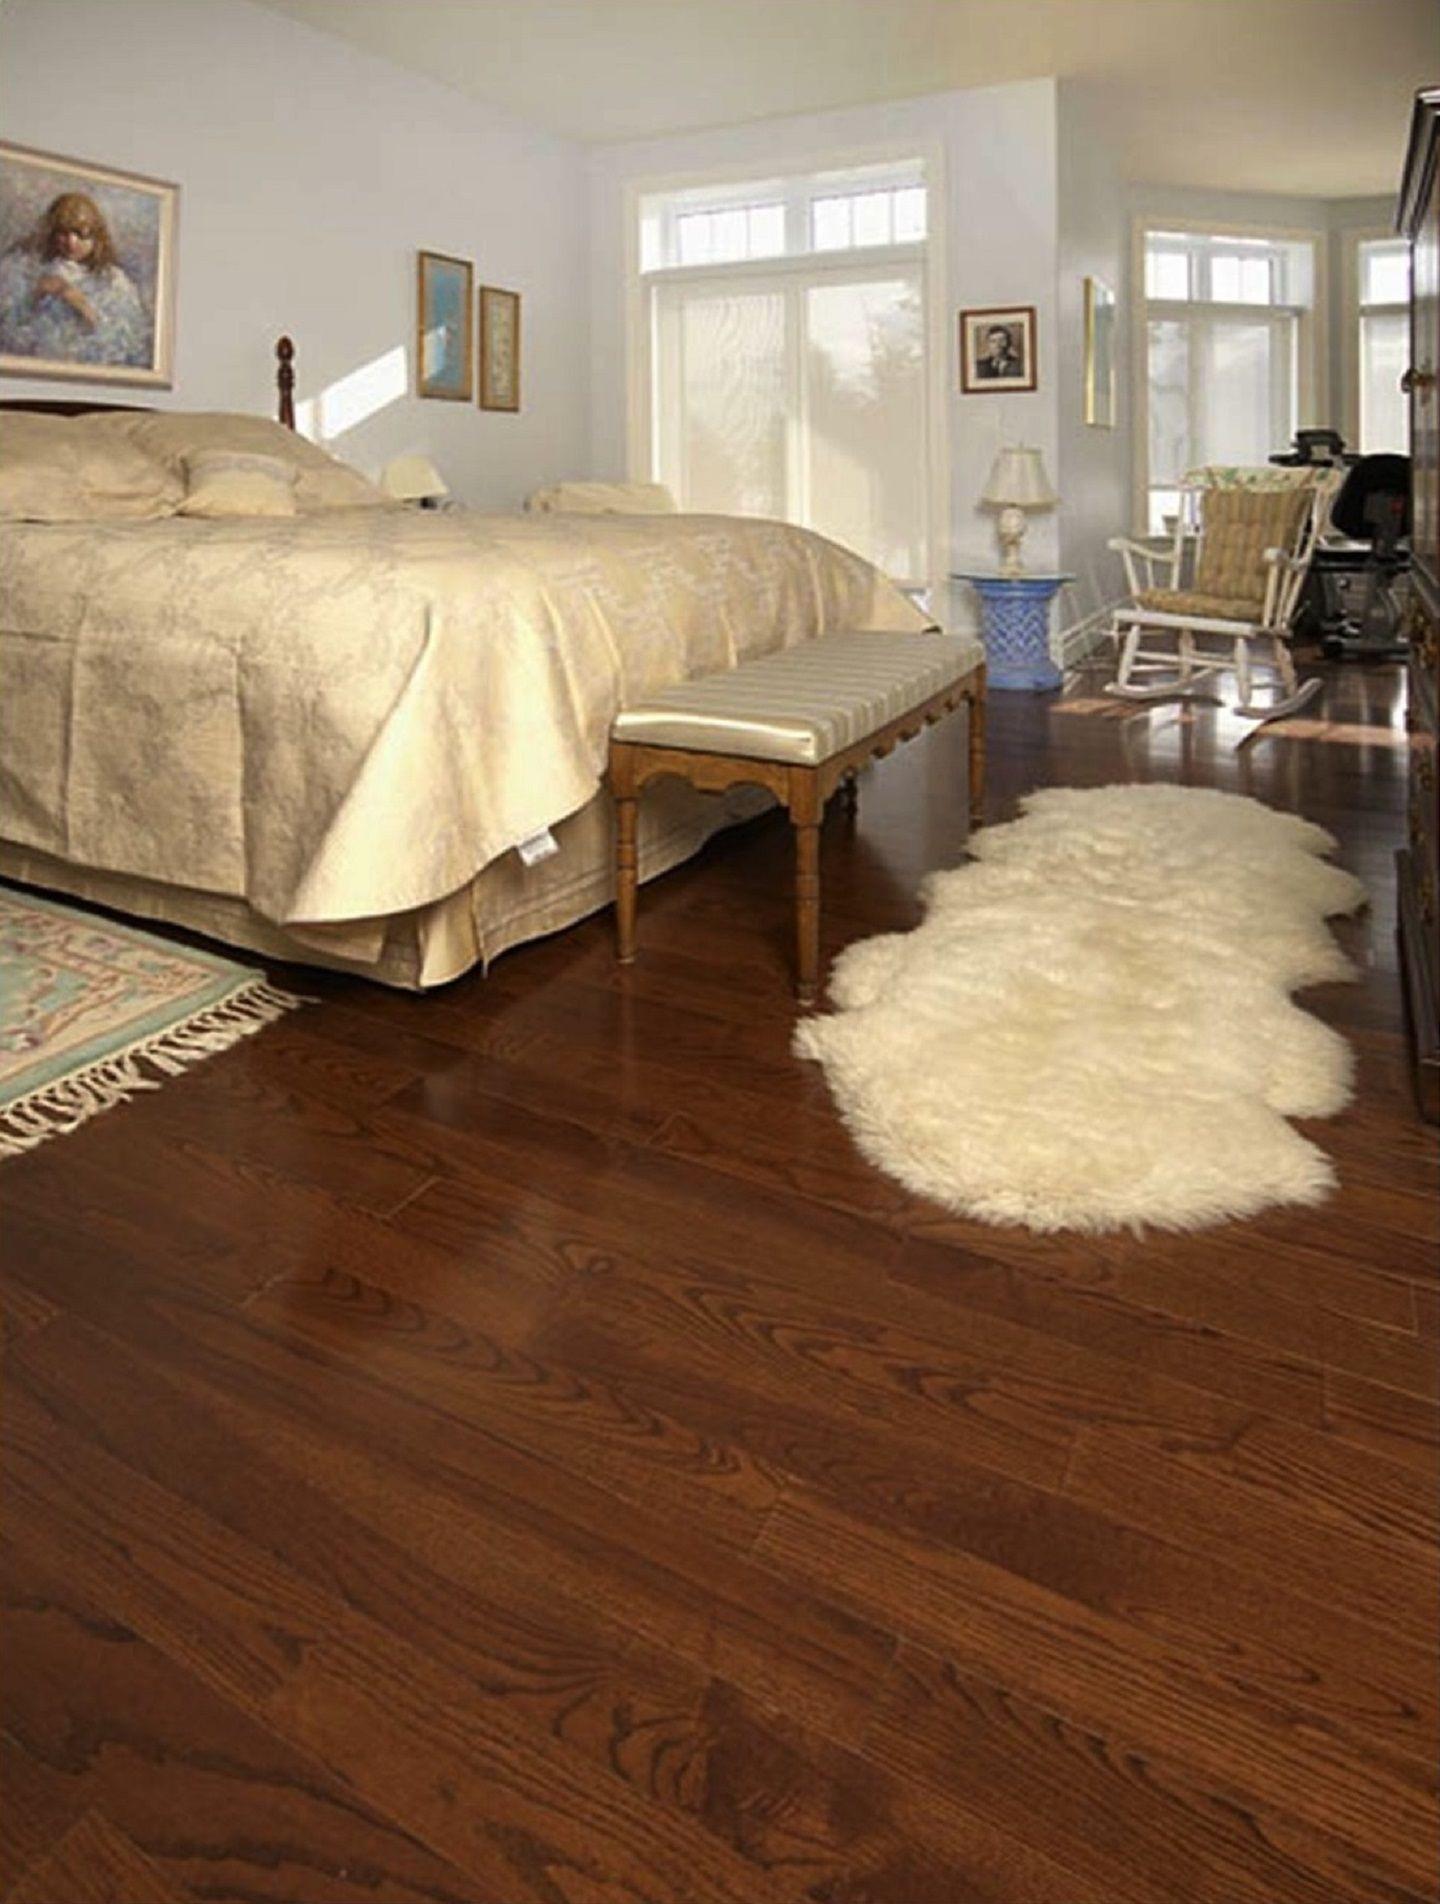 glue down prefinished hardwood flooring of ash brandon gaylord hardwood flooring hardwood floors pinterest regarding ash brandon gaylord hardwood flooring